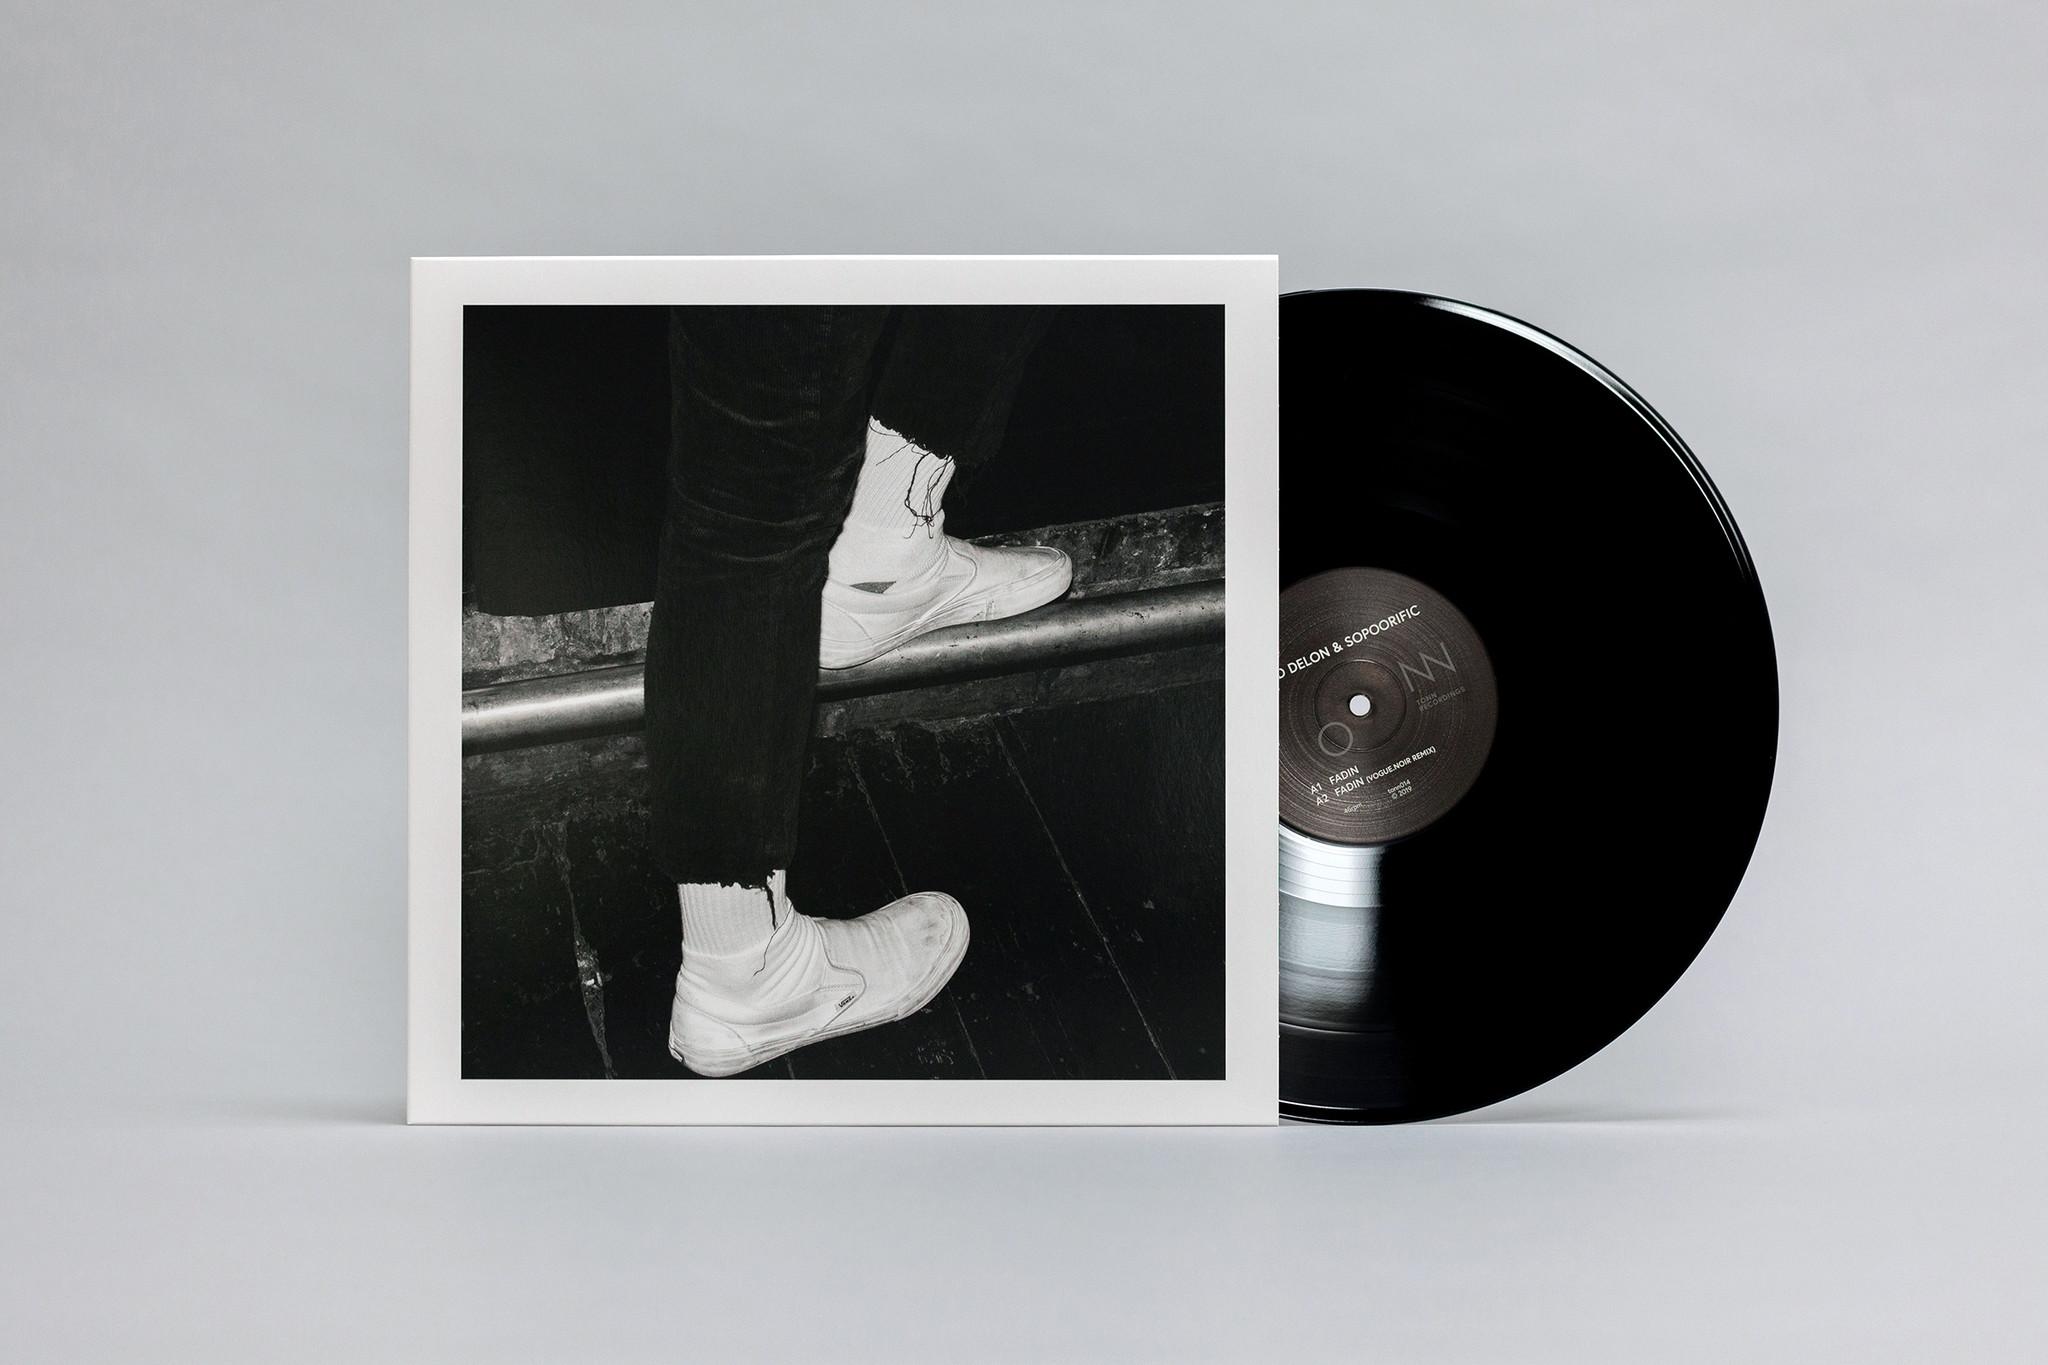 TONN Recordings Blind Delon & Sopoorific - The Seep